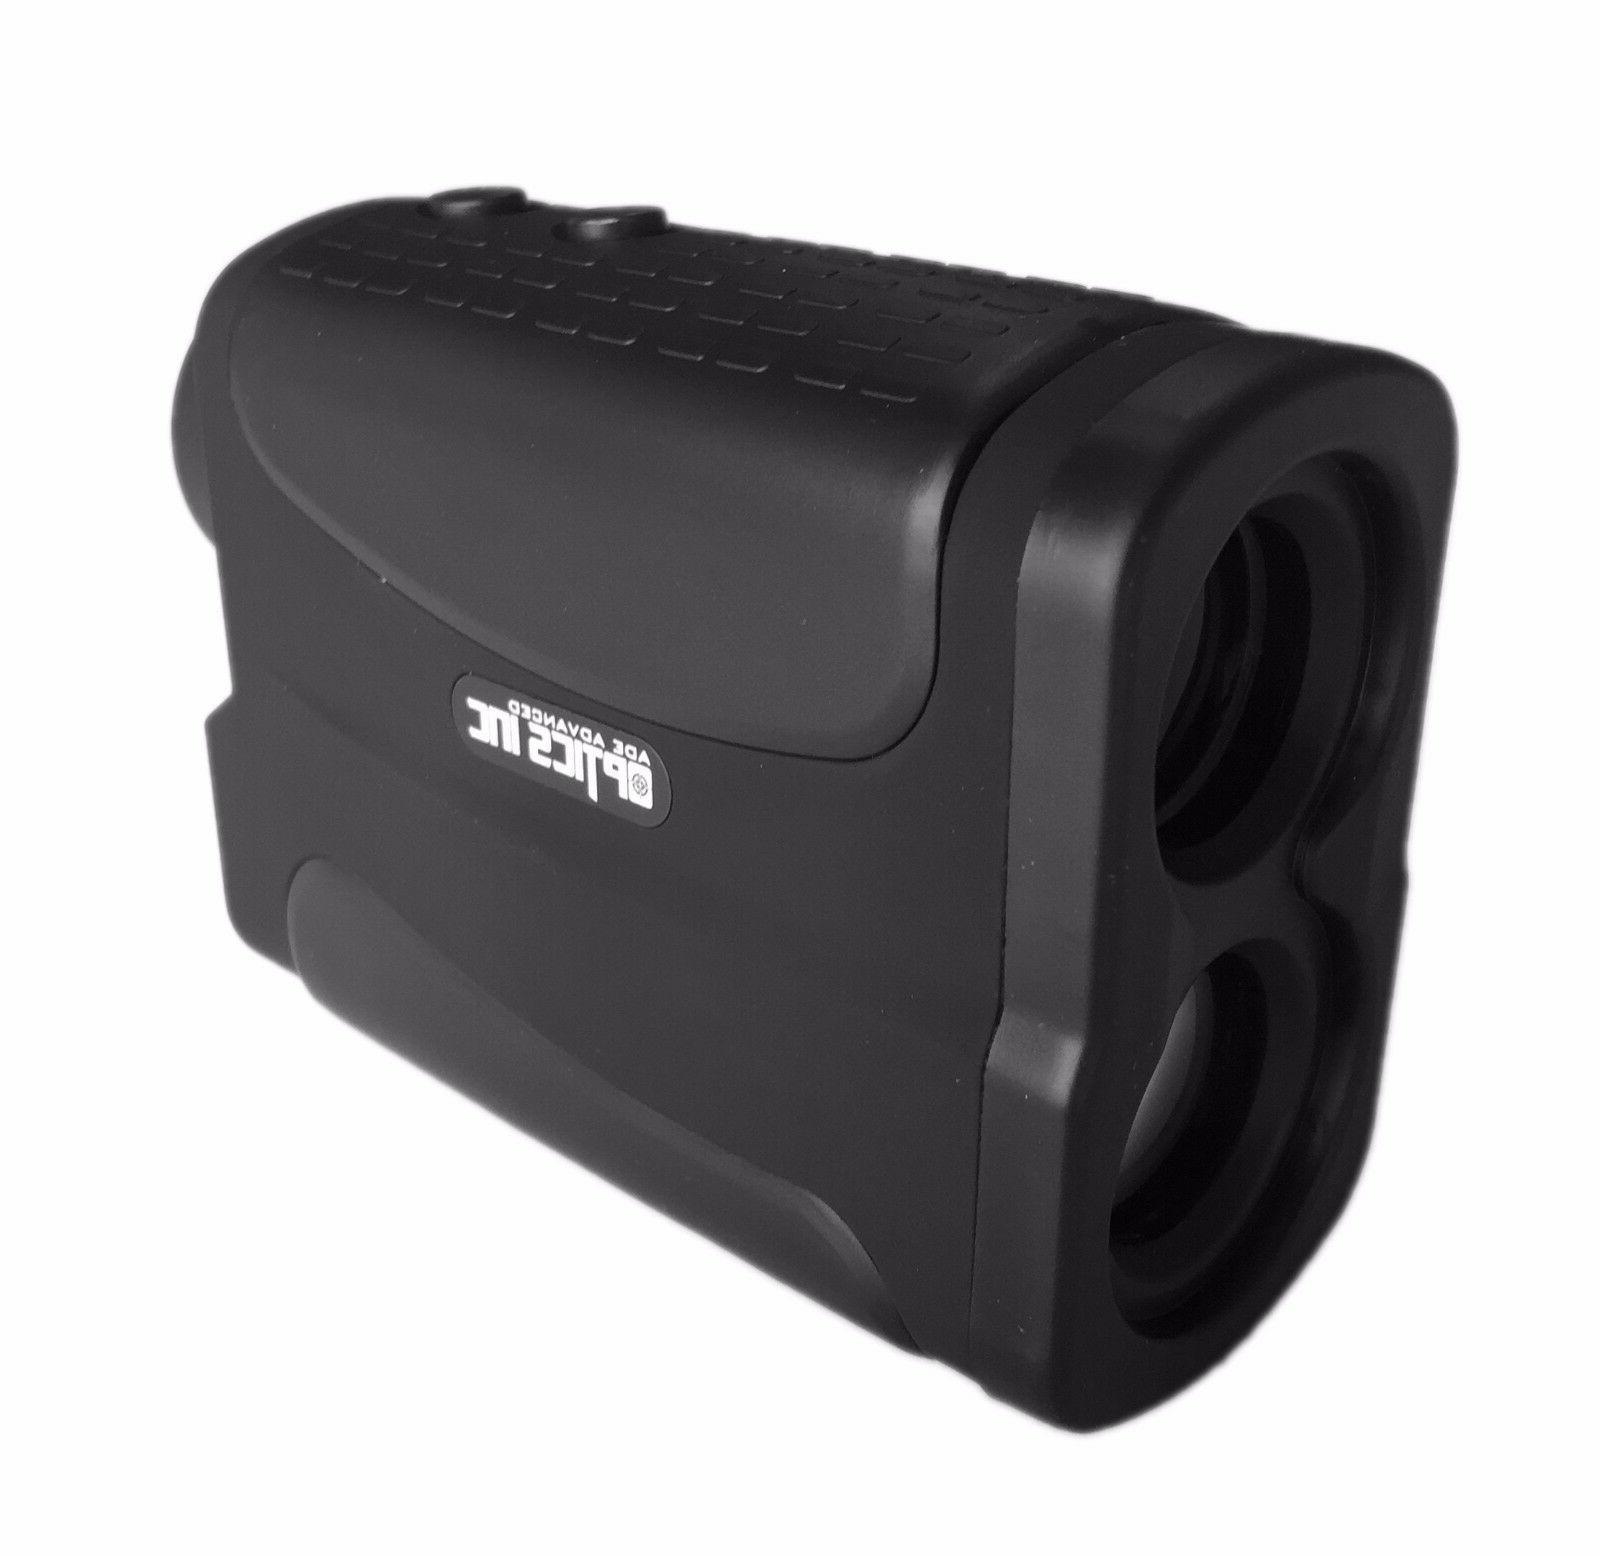 ade optics 700 yard golf laser range